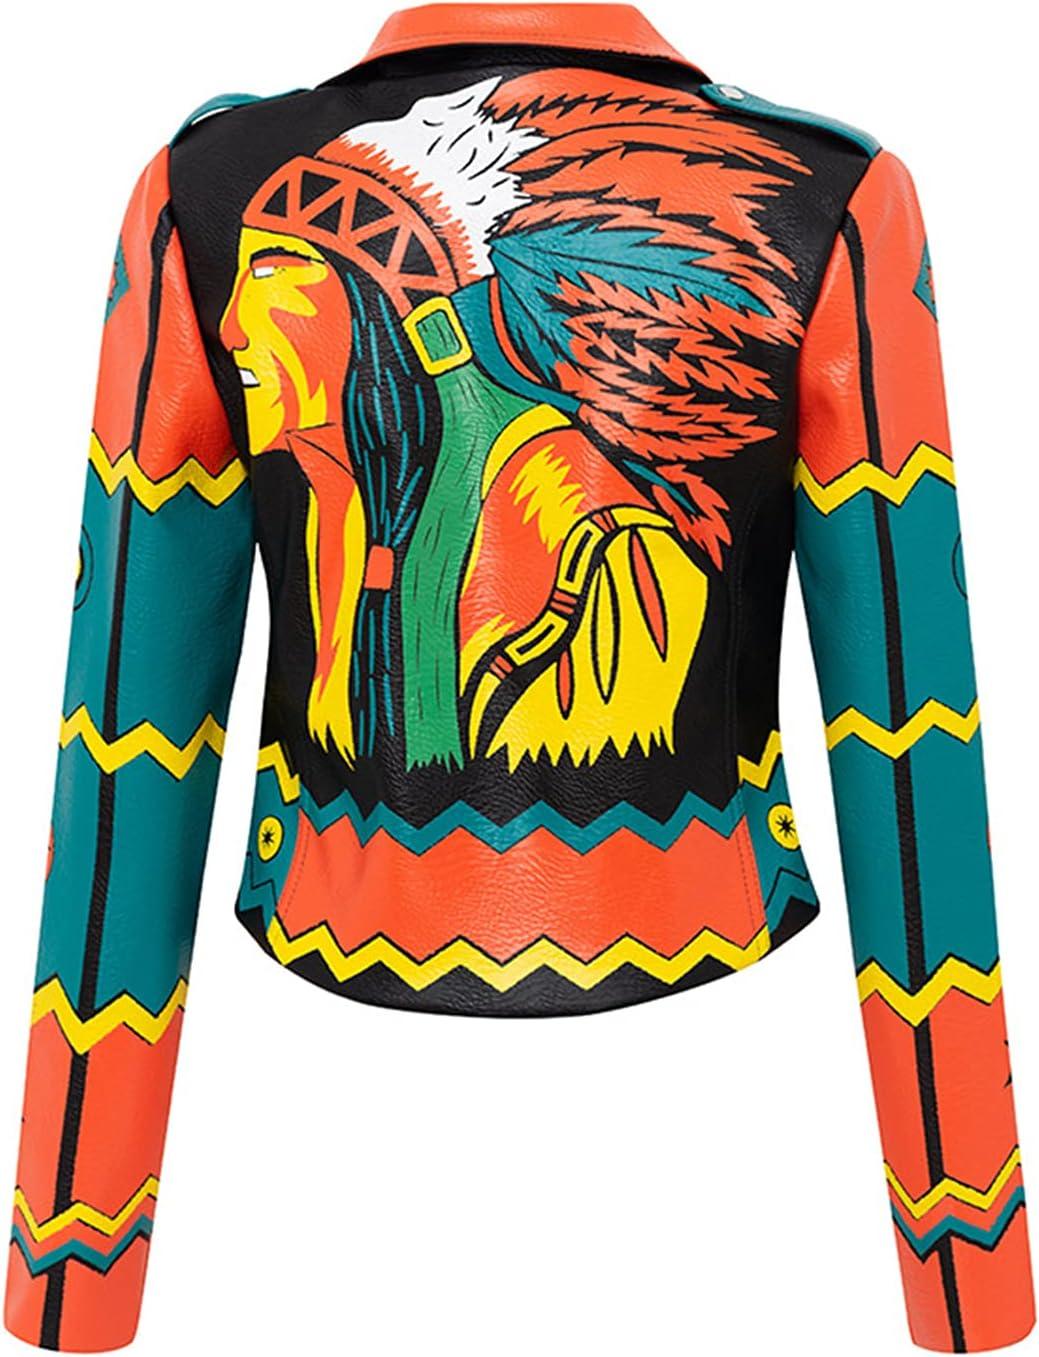 YHNY Women's Leather Jacket Graffiti Printed Motorcycle Rider Slim Short Coat Suit Neckline Punk Rock Casual Sweatshirt Orange-M